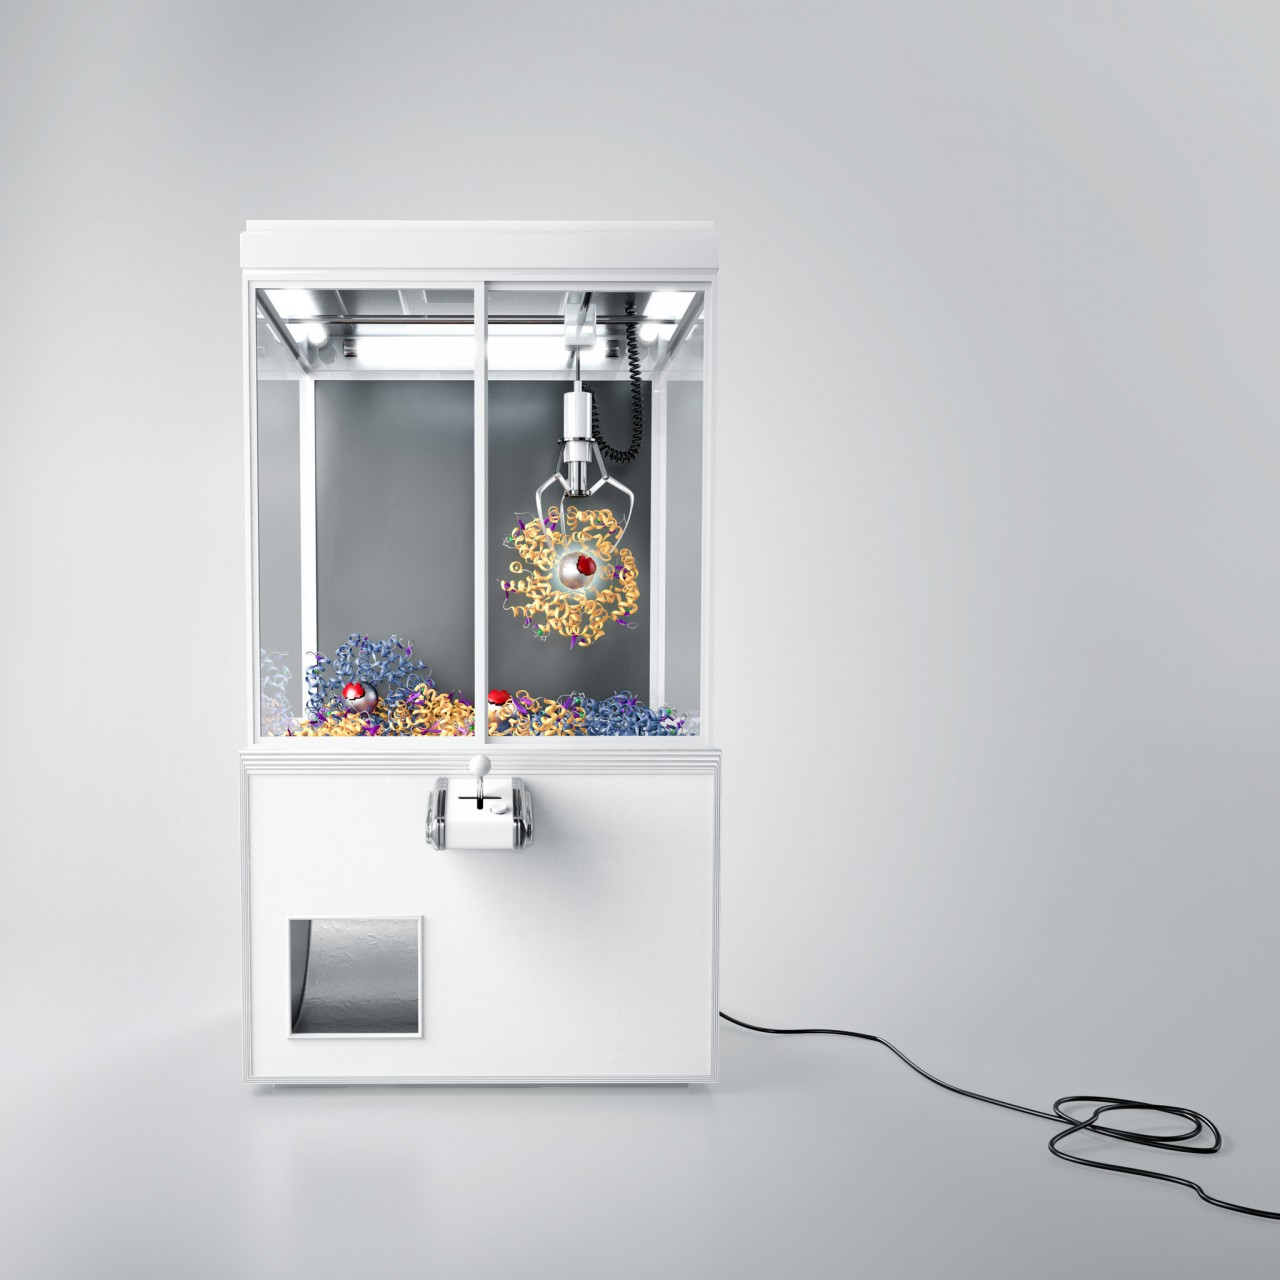 grabber machine